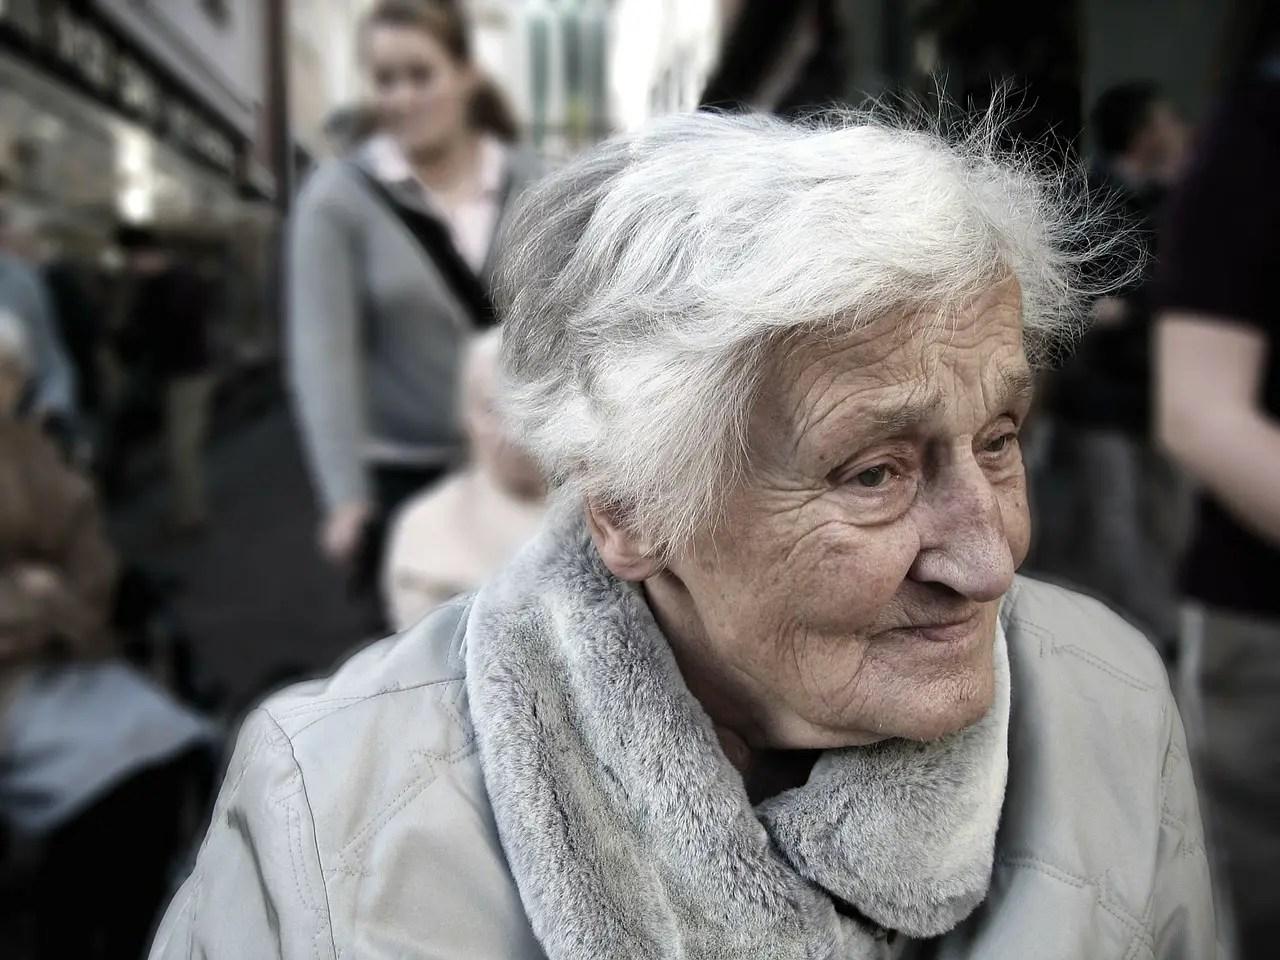 Canada live in caregiver program